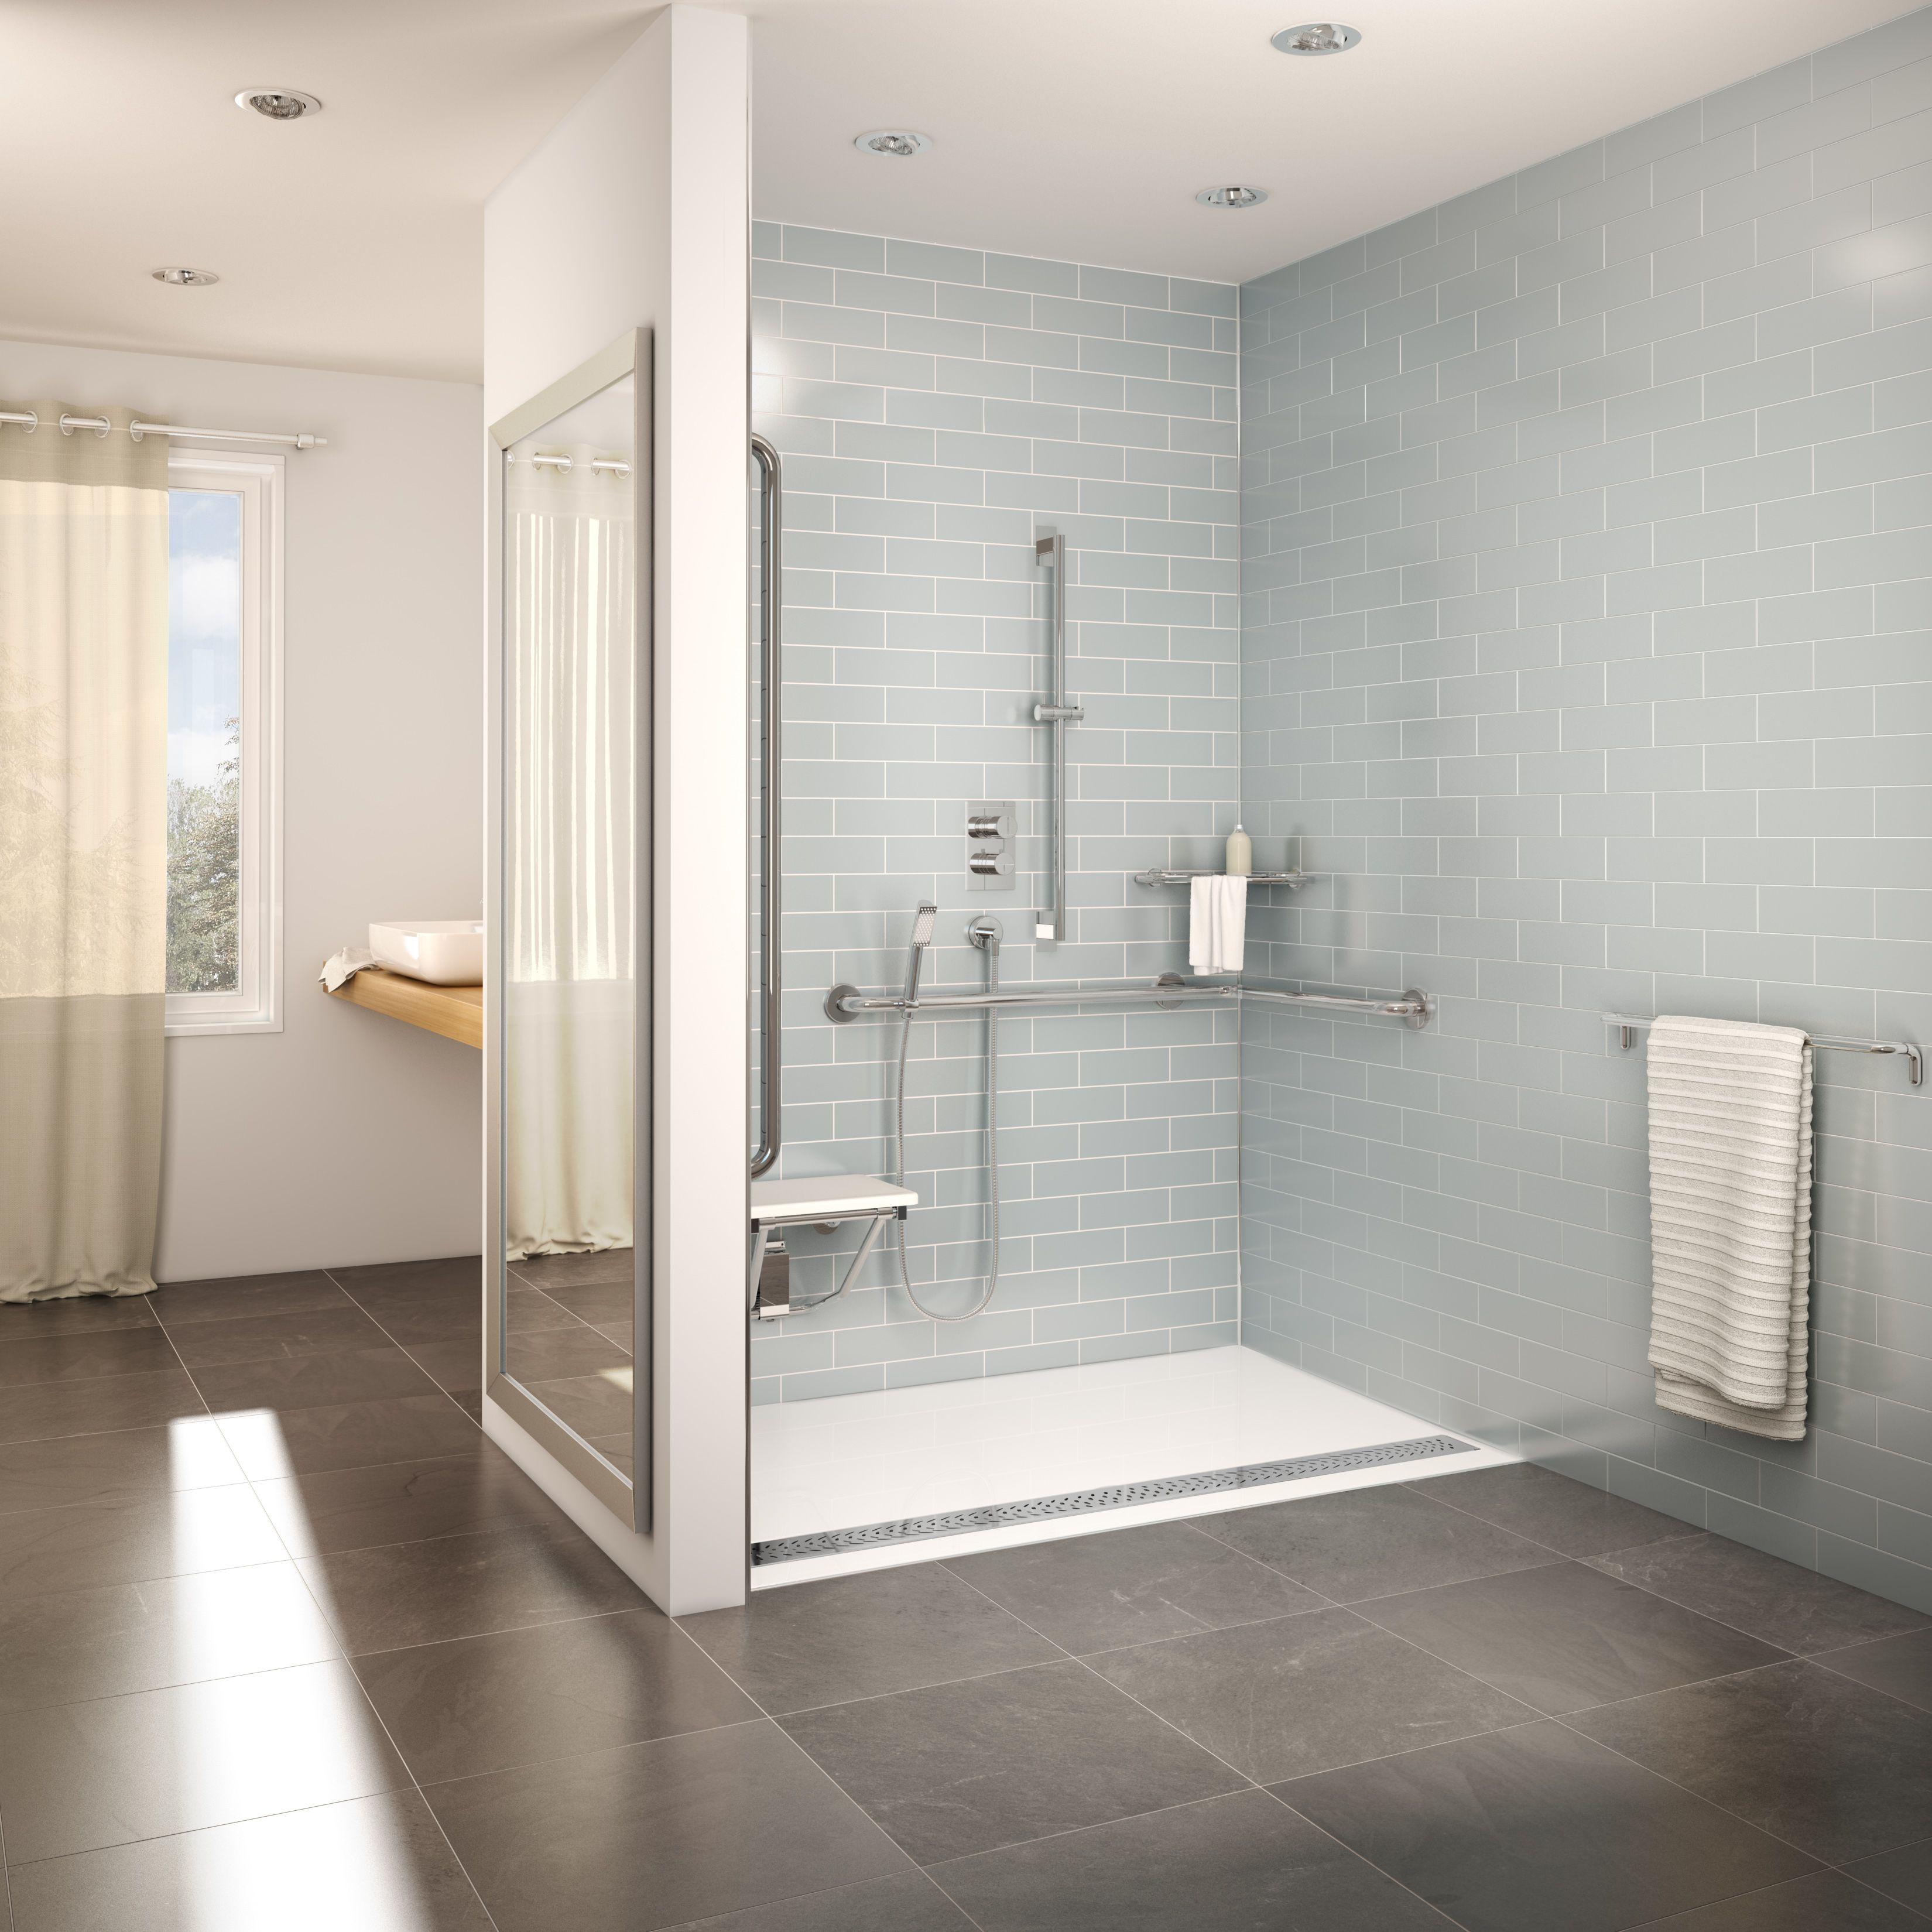 Fleurco adaptek shower base roll in typ fleurco bathroom for Ada bathroom design ideas